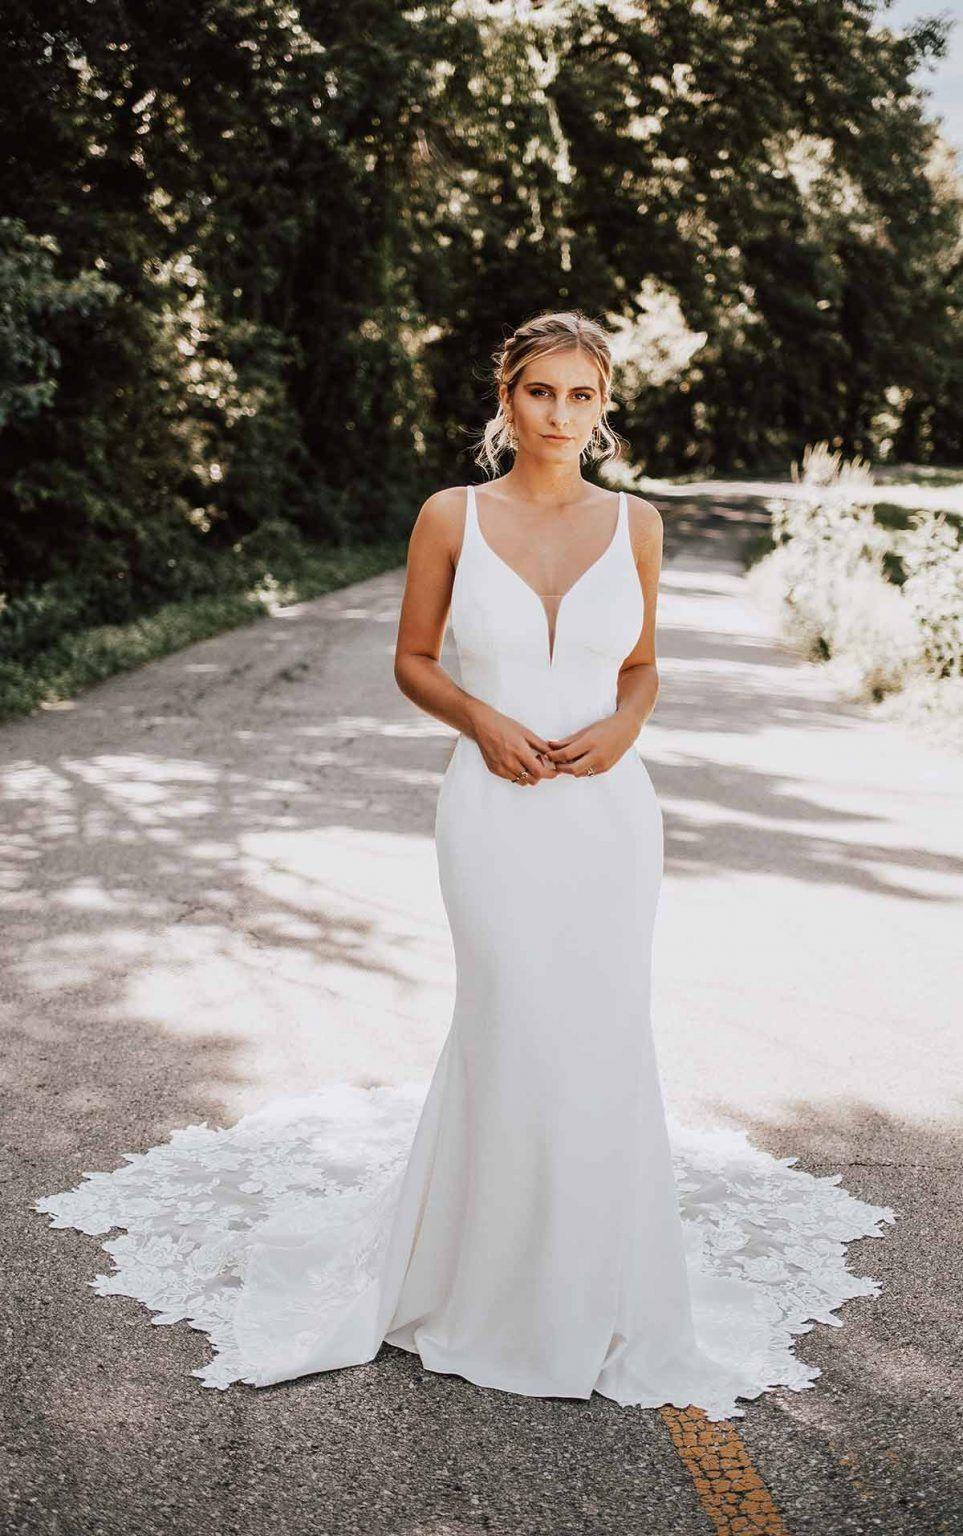 Clean Sheath Wedding Dress With Organic Train Kleinfeld Bridal Essense Of Australia Wedding Dresses Fit And Flare Wedding Dress Sheath Wedding Dress [ 1536 x 963 Pixel ]